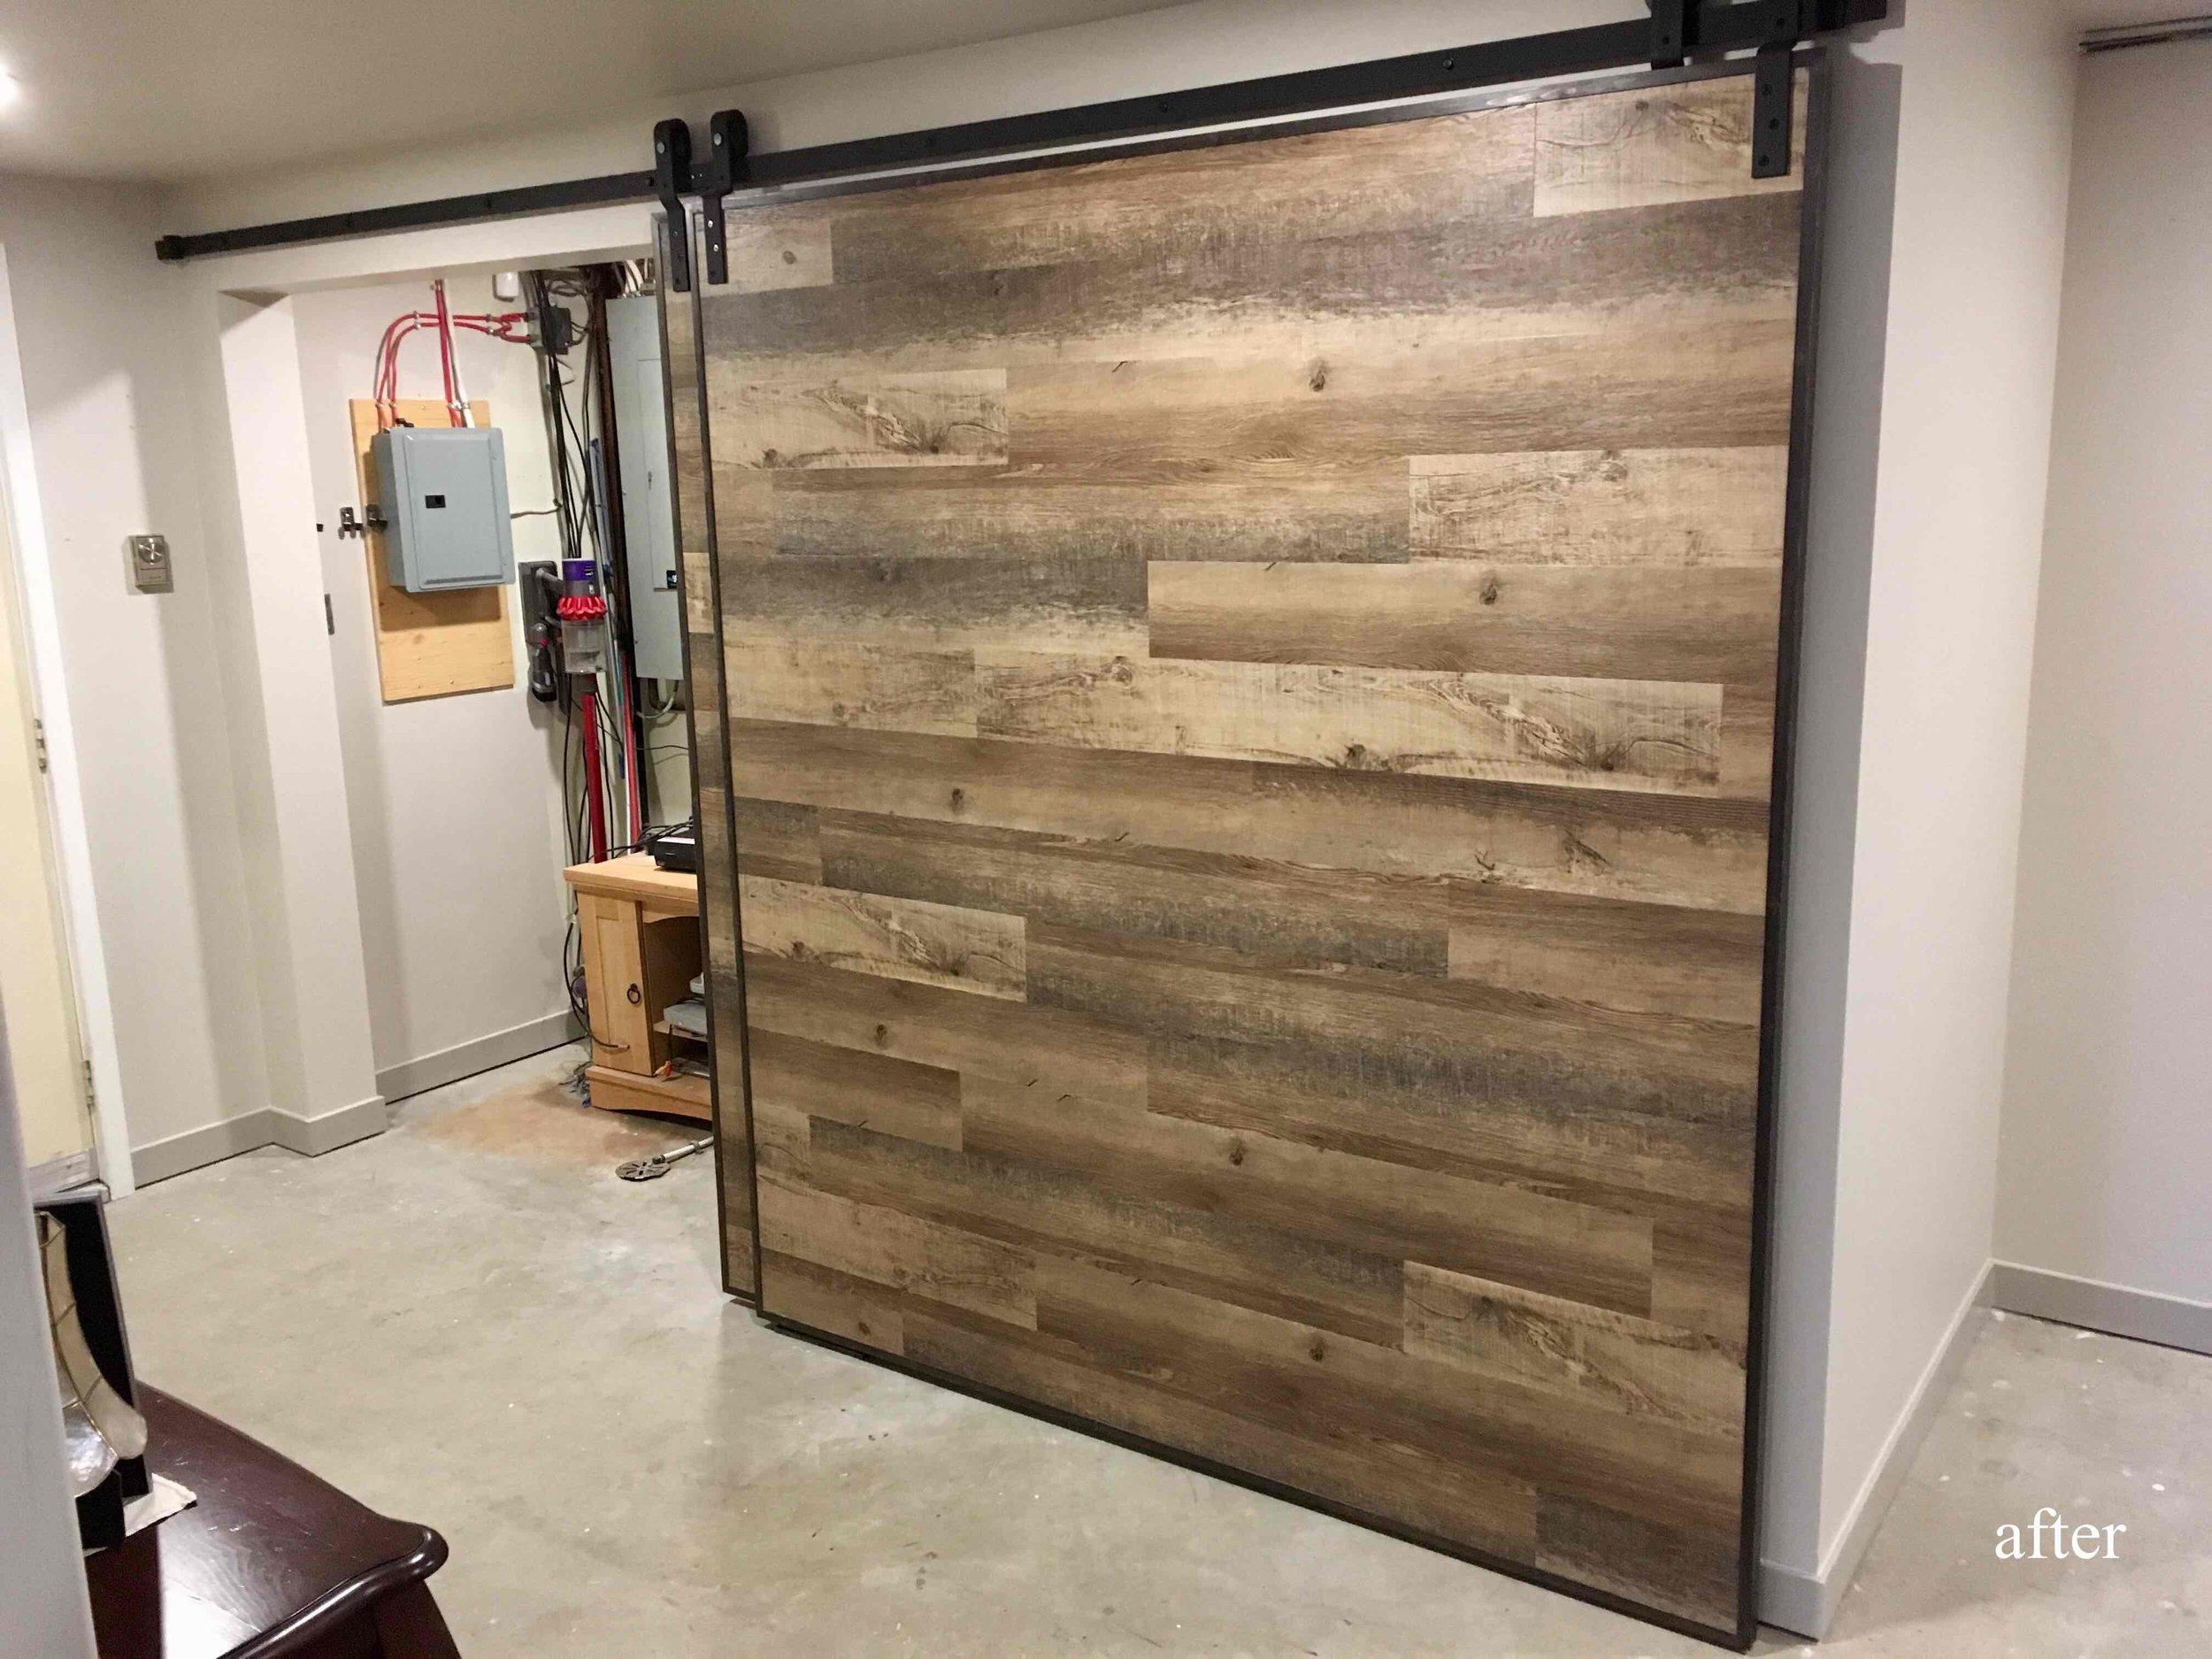 Custom barn doors to hide a basement storage area in the East Kootenays.